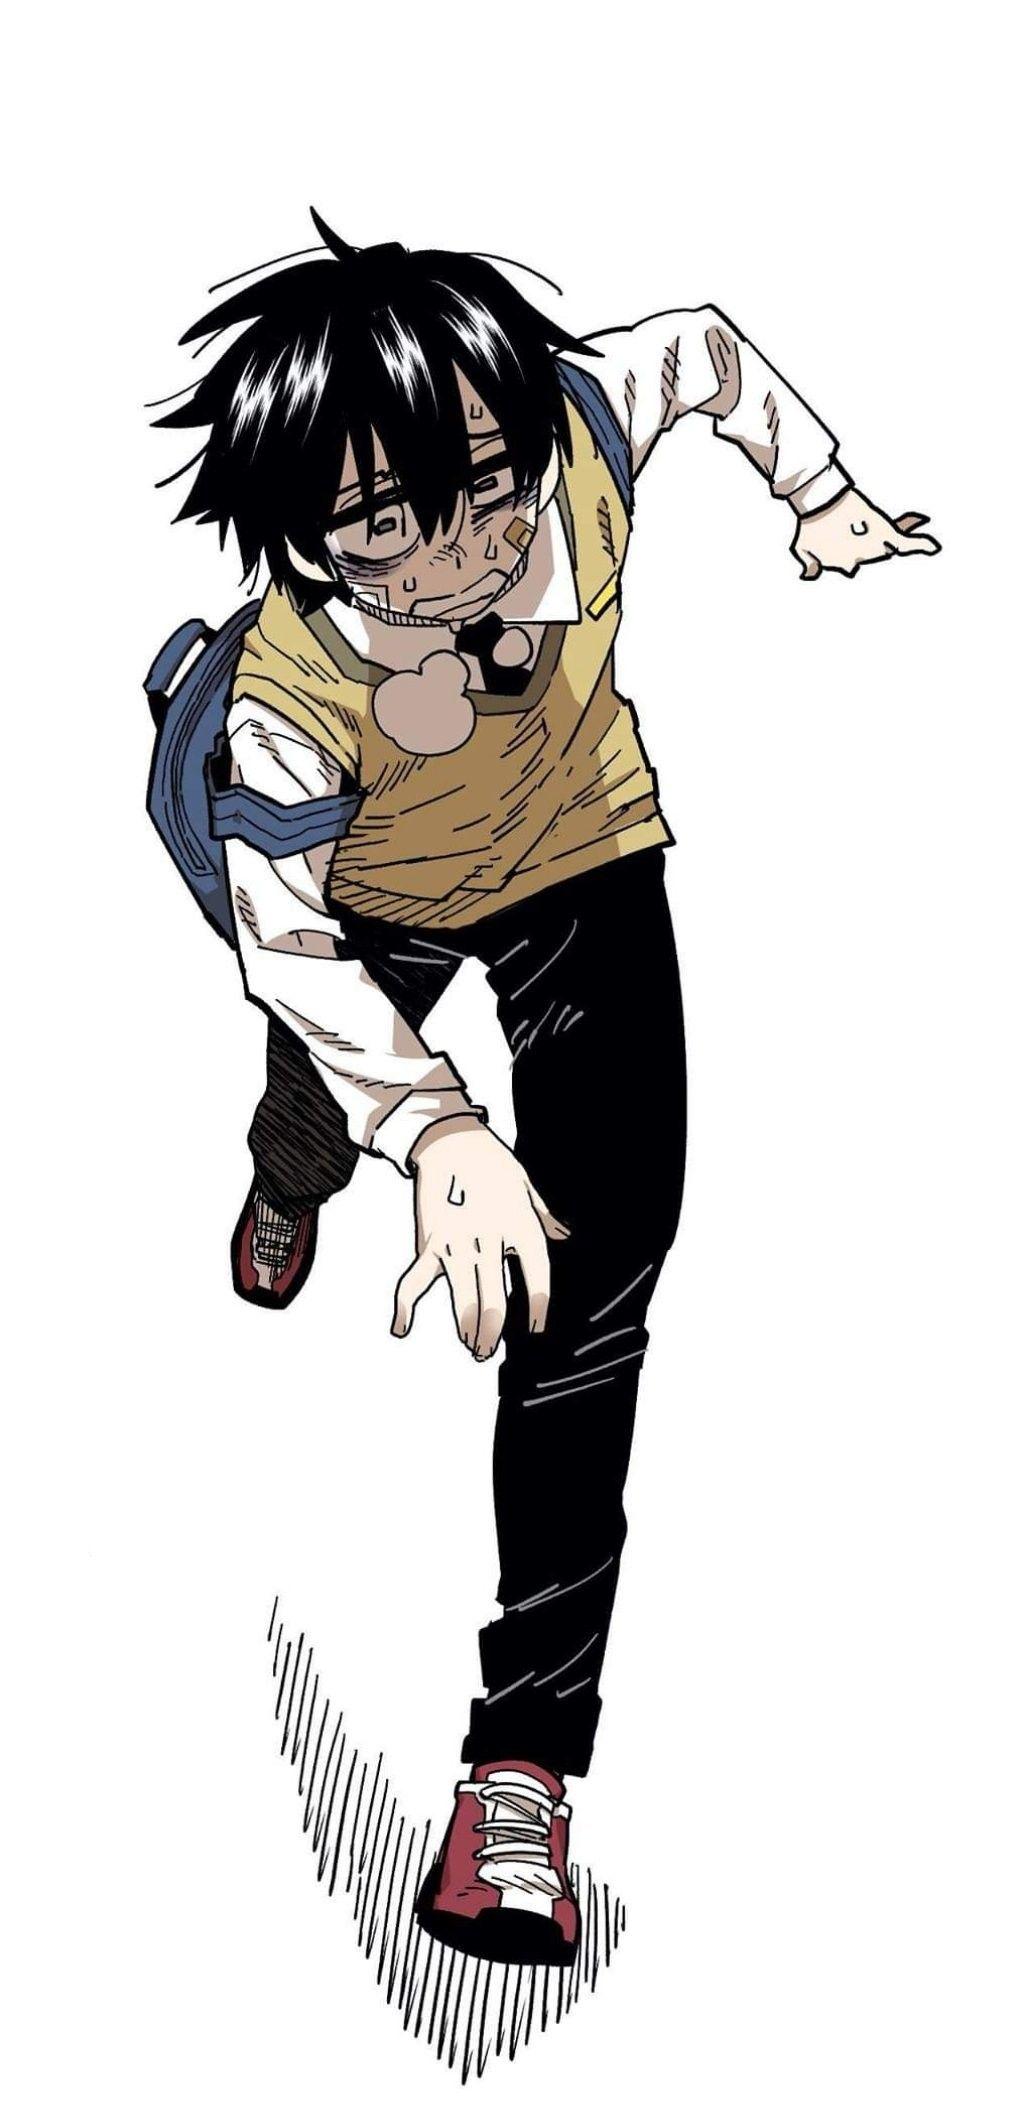 Anime Boy Running : anime, running, Hooni, Anime, Poses,, Catboy,